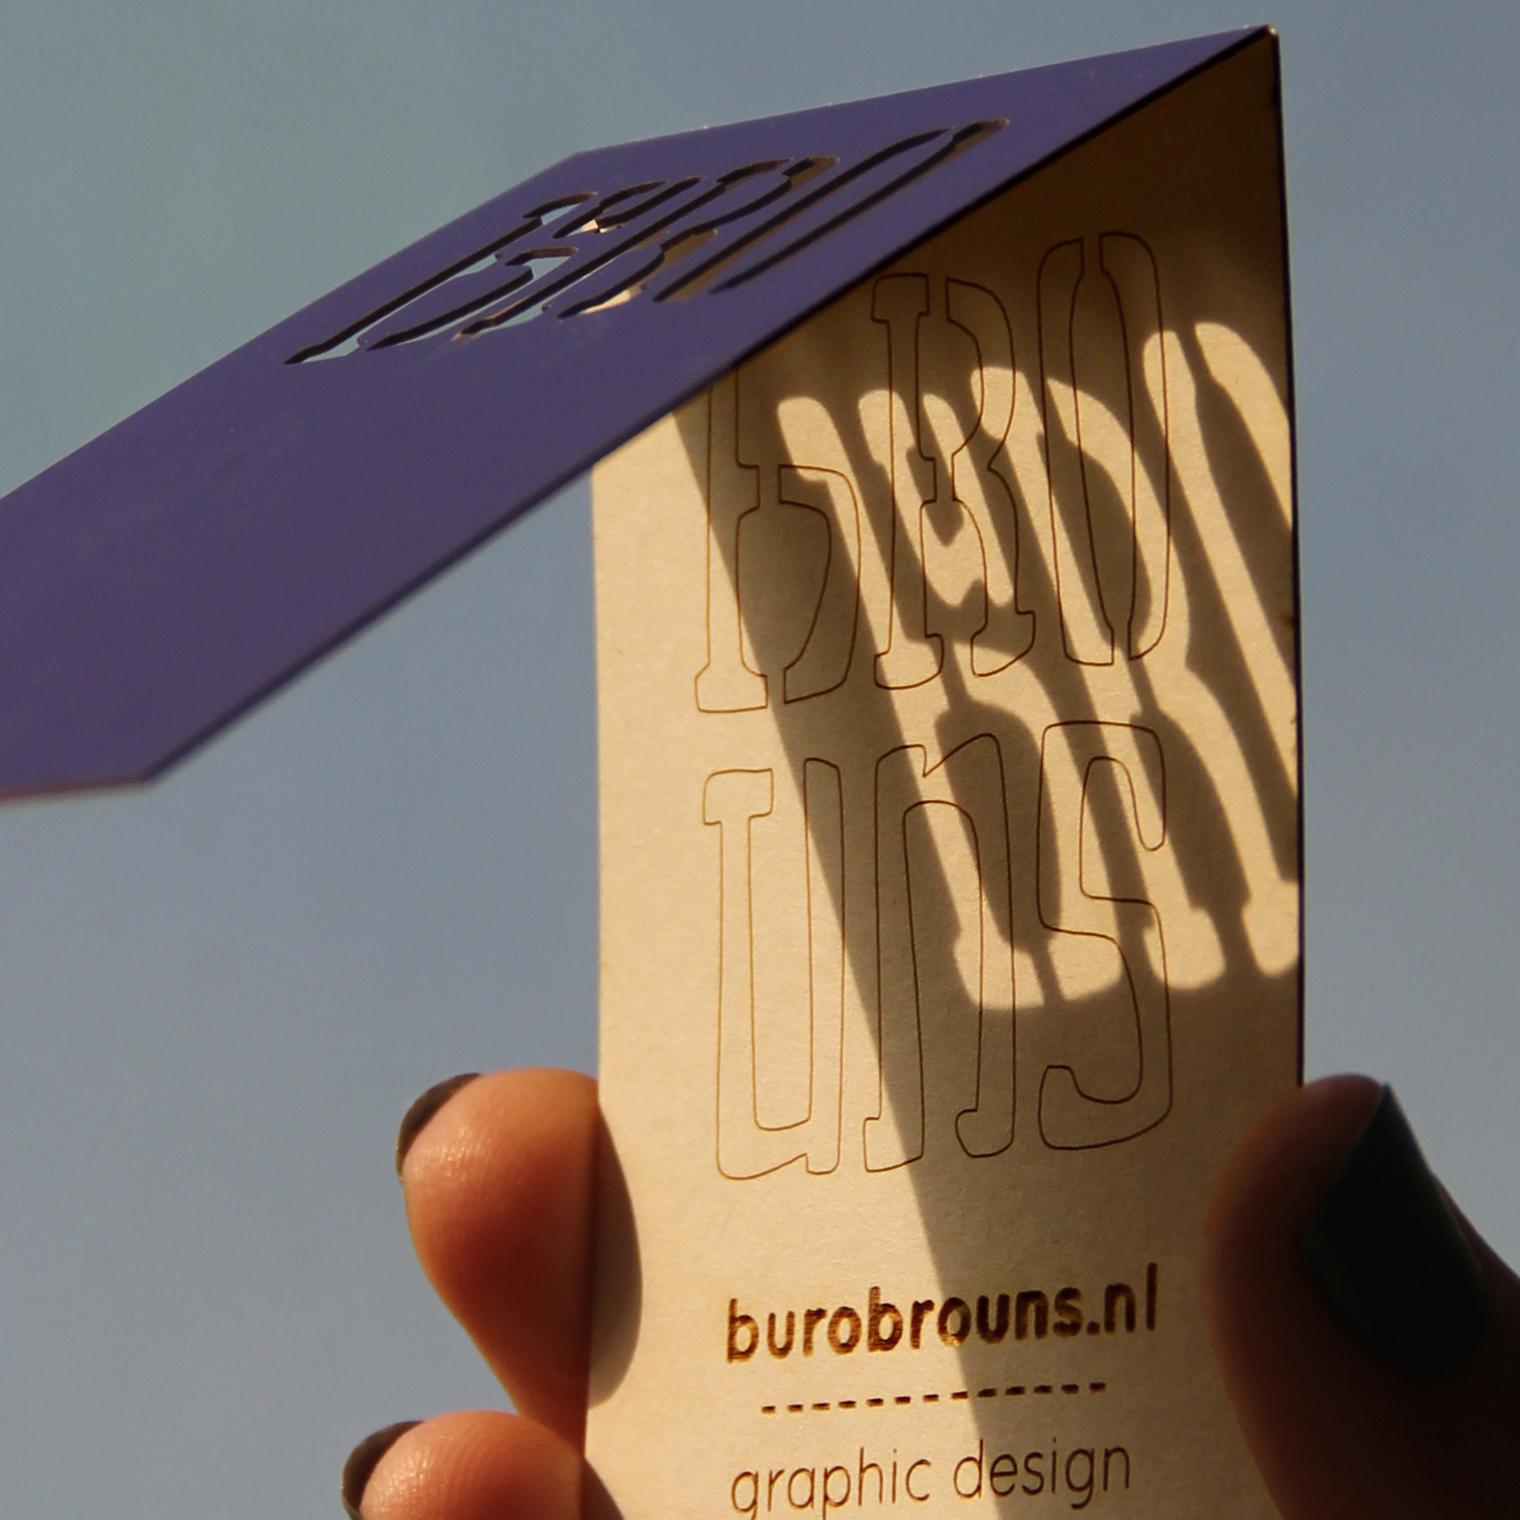 Buro brouns verse site verse kaarten buro brouns for Buro website